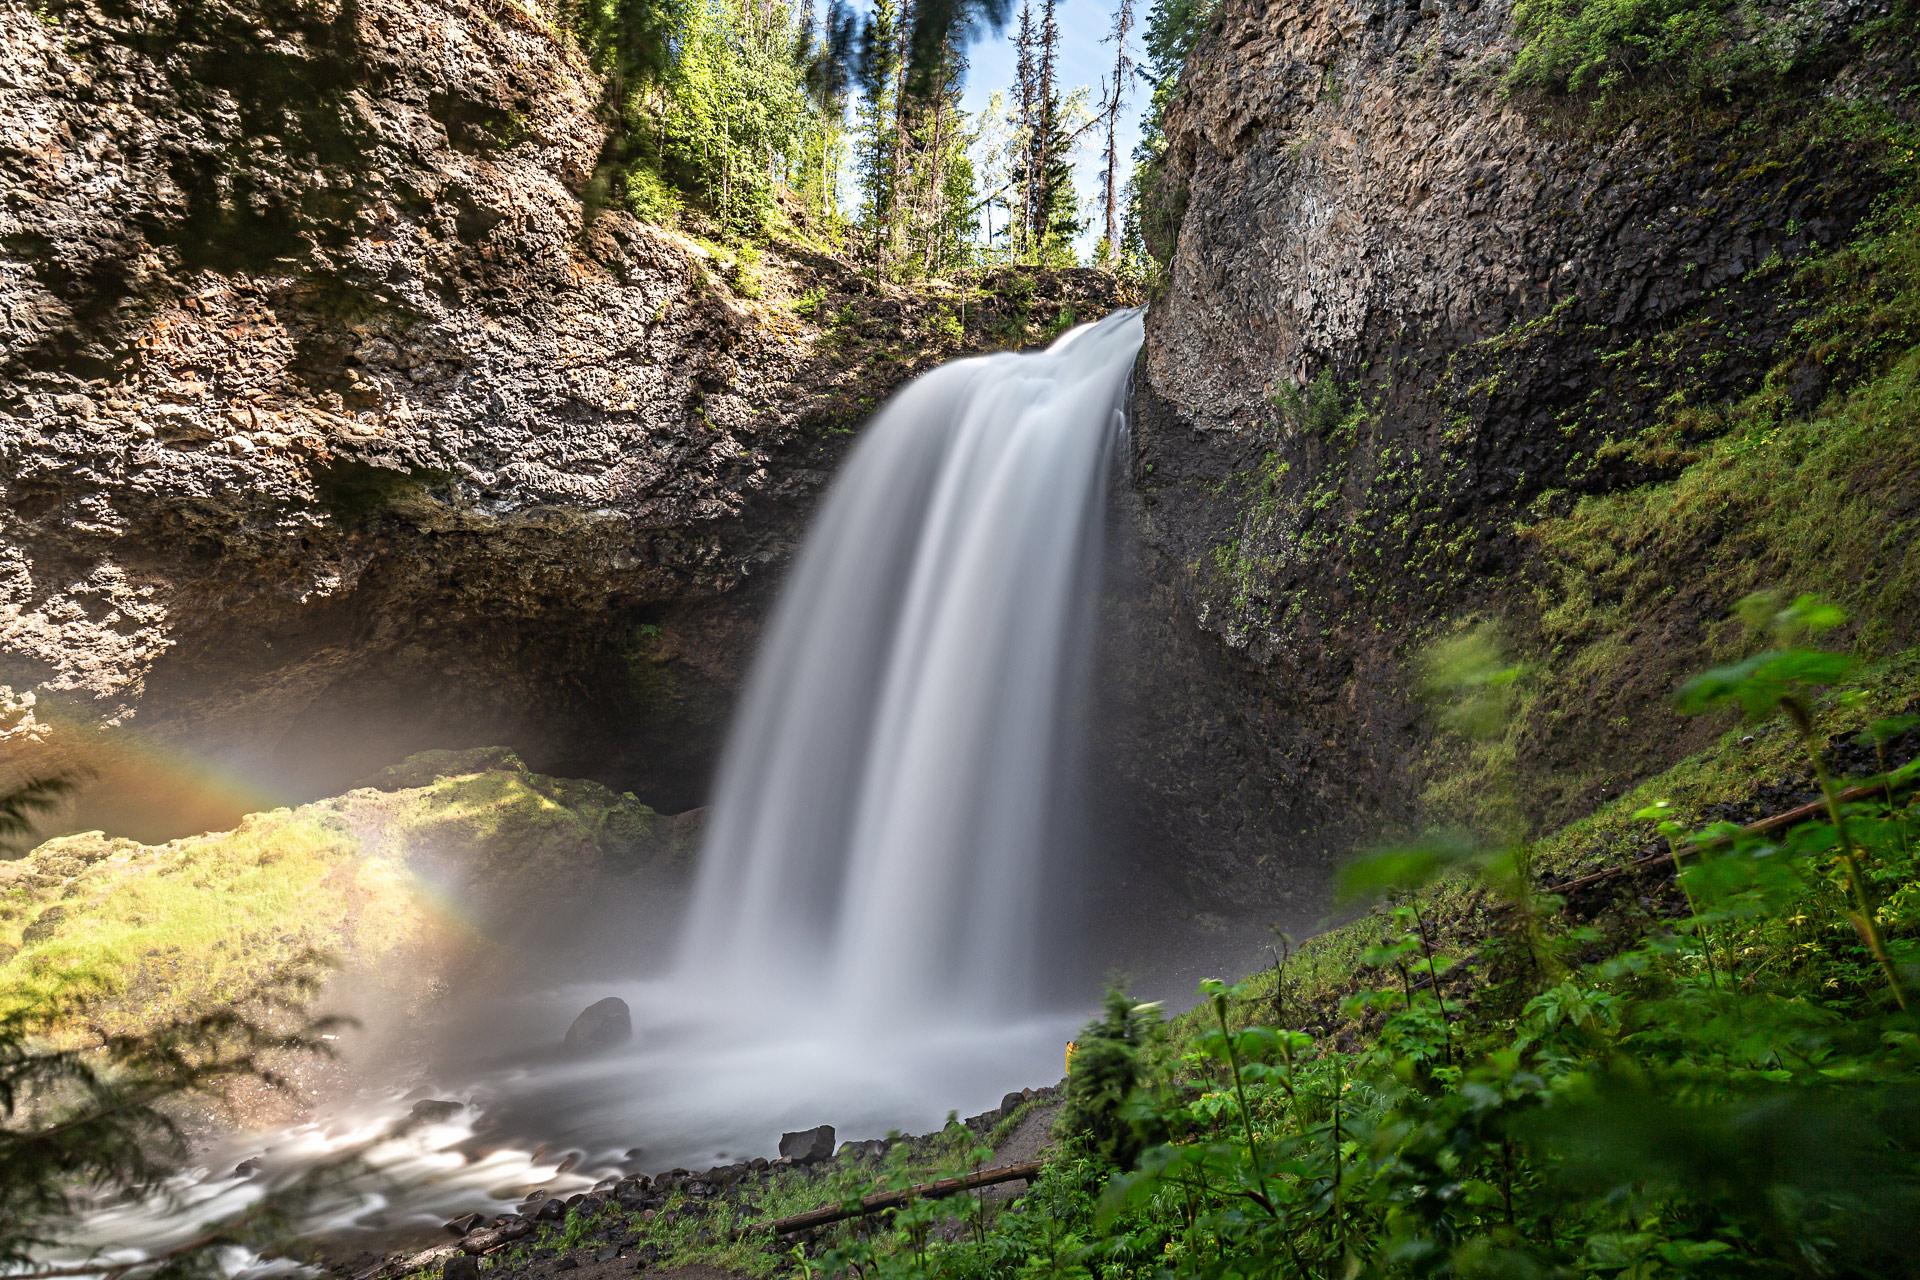 Moul Falls Wells Grey Colombie-Britannique Canada